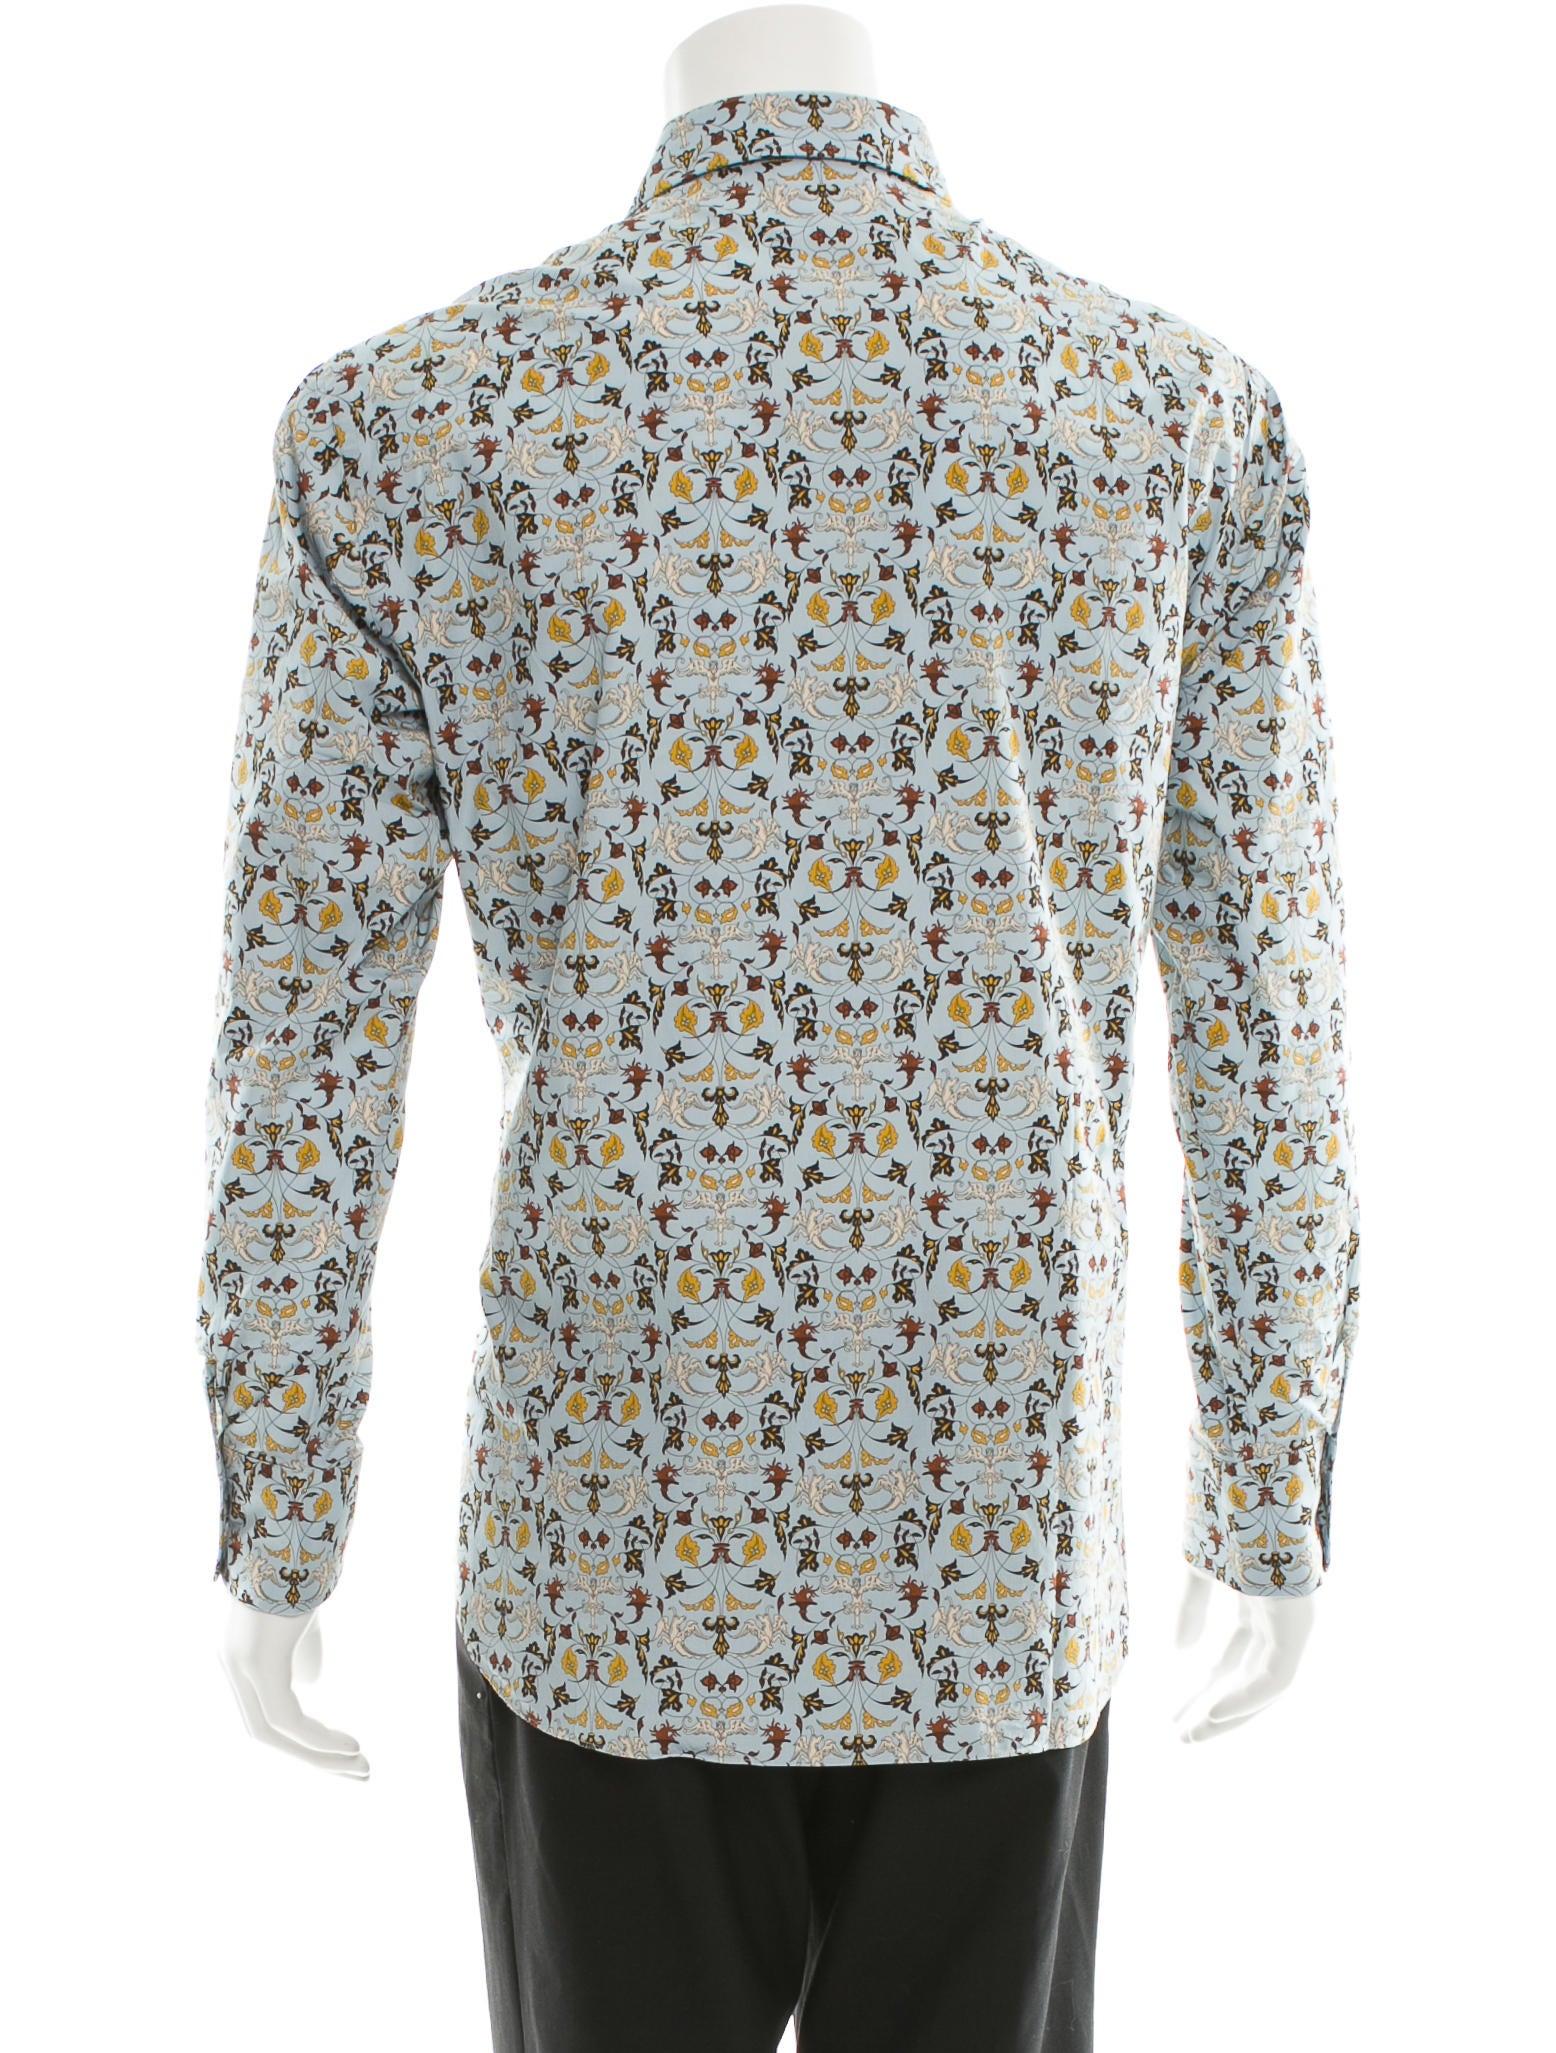 Brioni floral print button up shirt clothing bro21198 for Floral print button up shirt